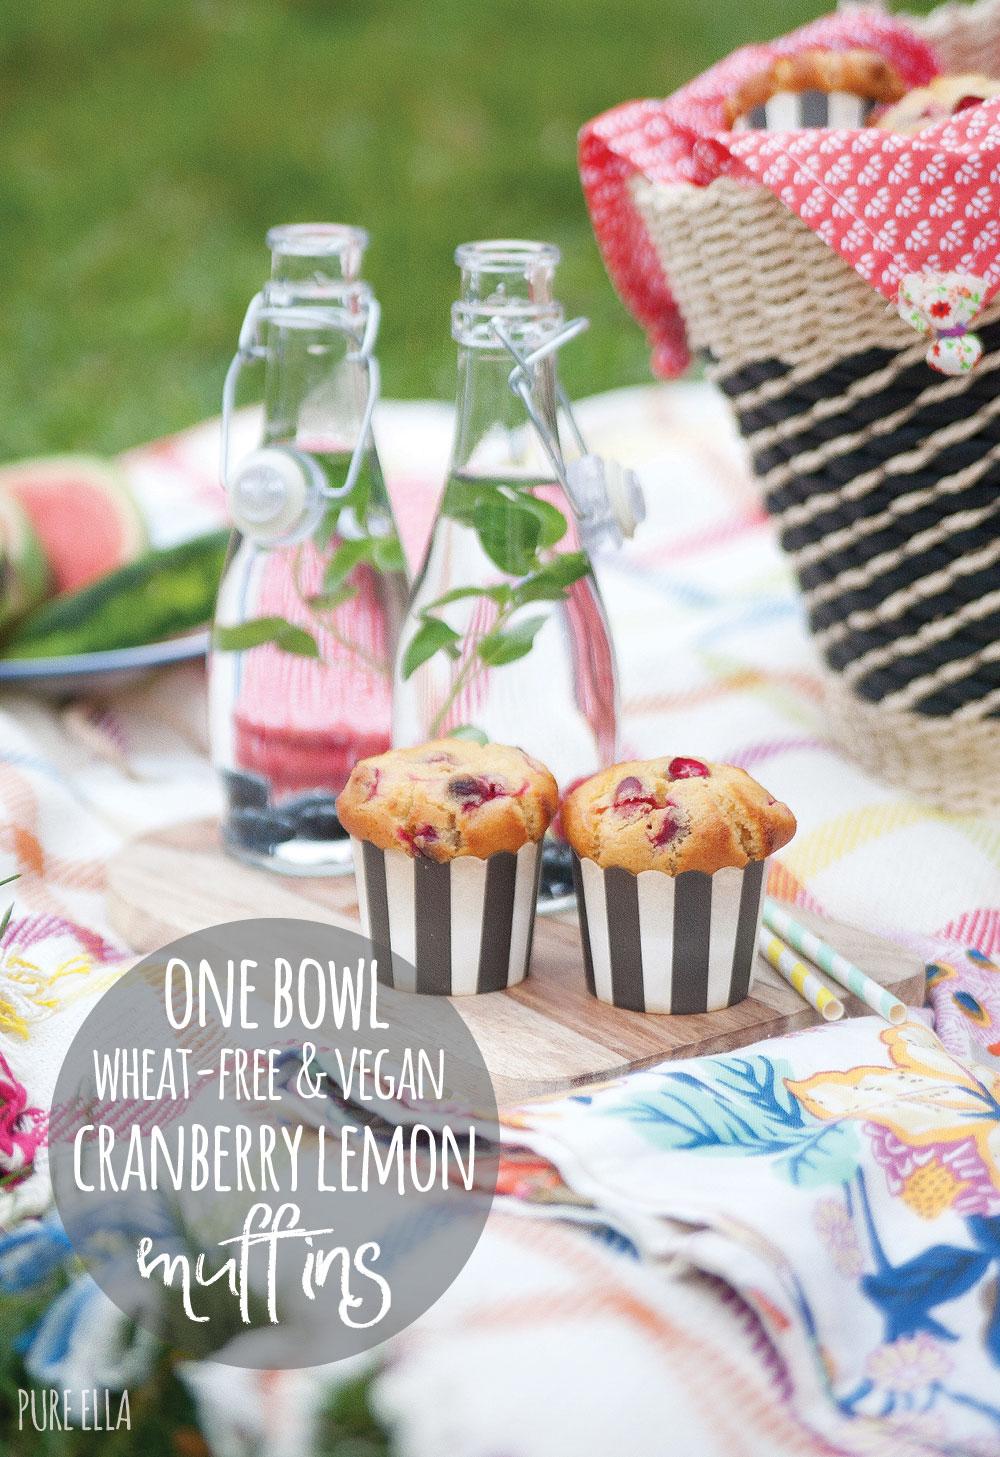 Gluten-Free-Vegan-Cranberry-Lemon-Muffins-Pure-Ella-Leche10